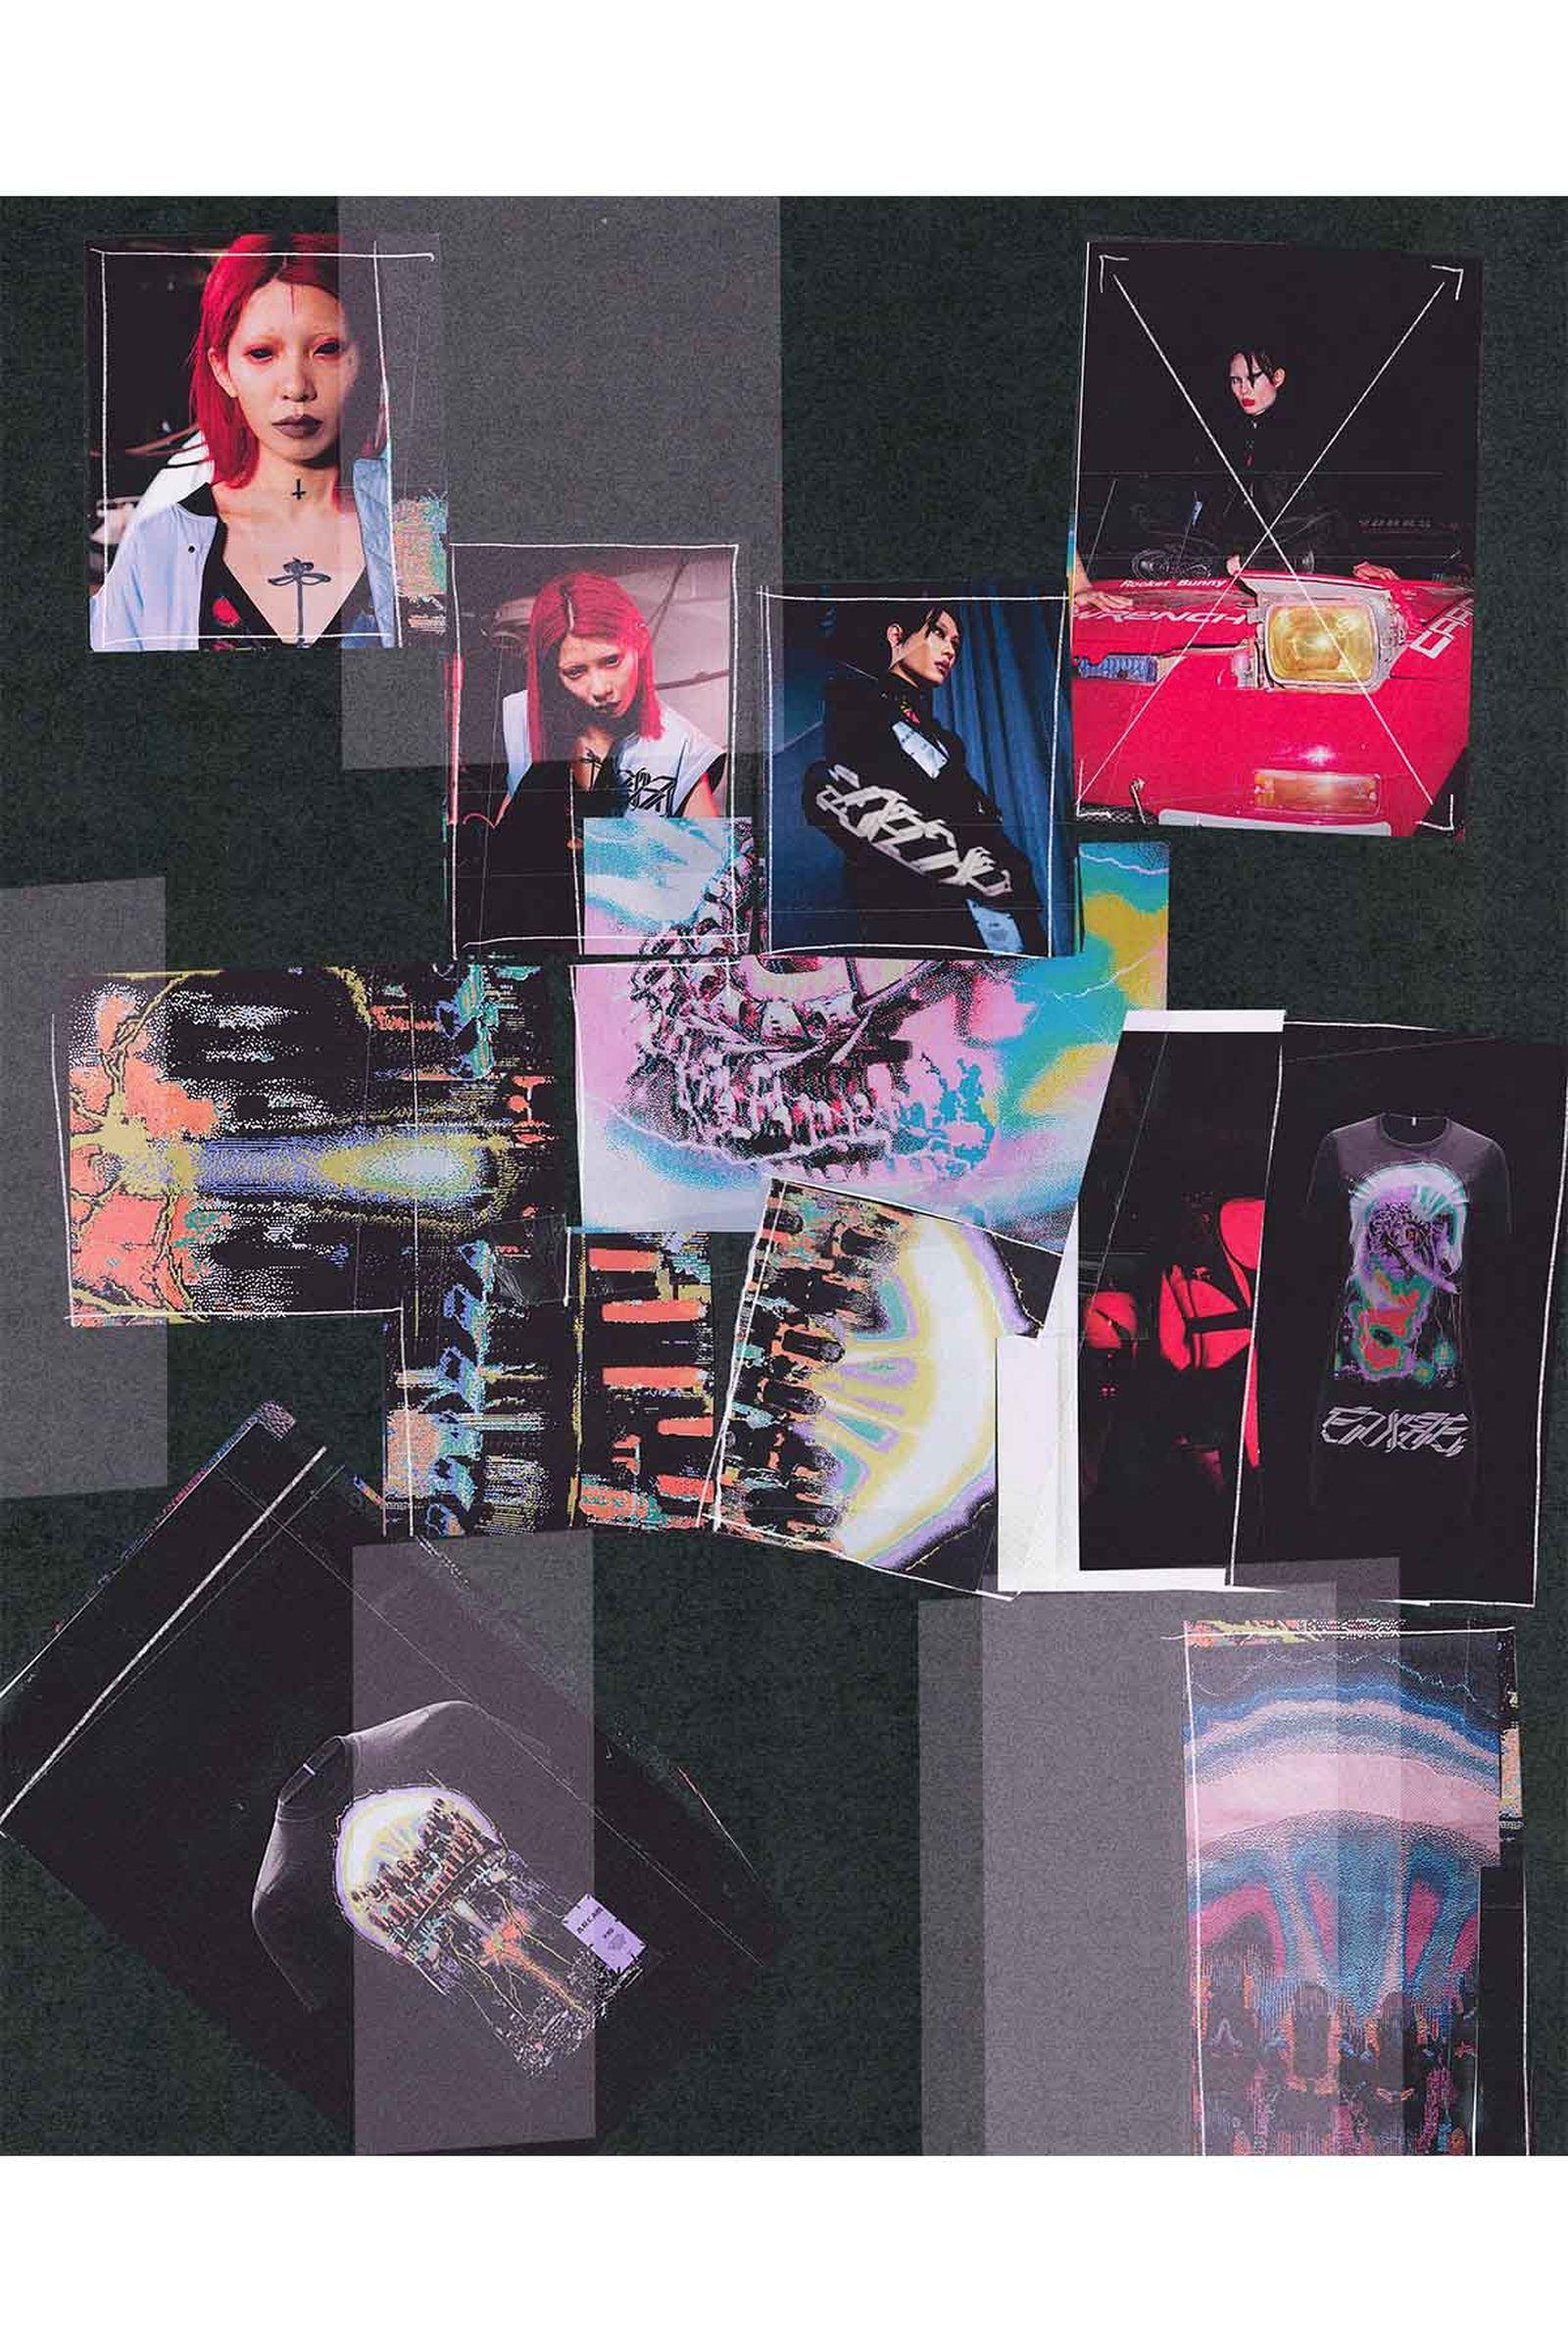 mcq-arcade-11